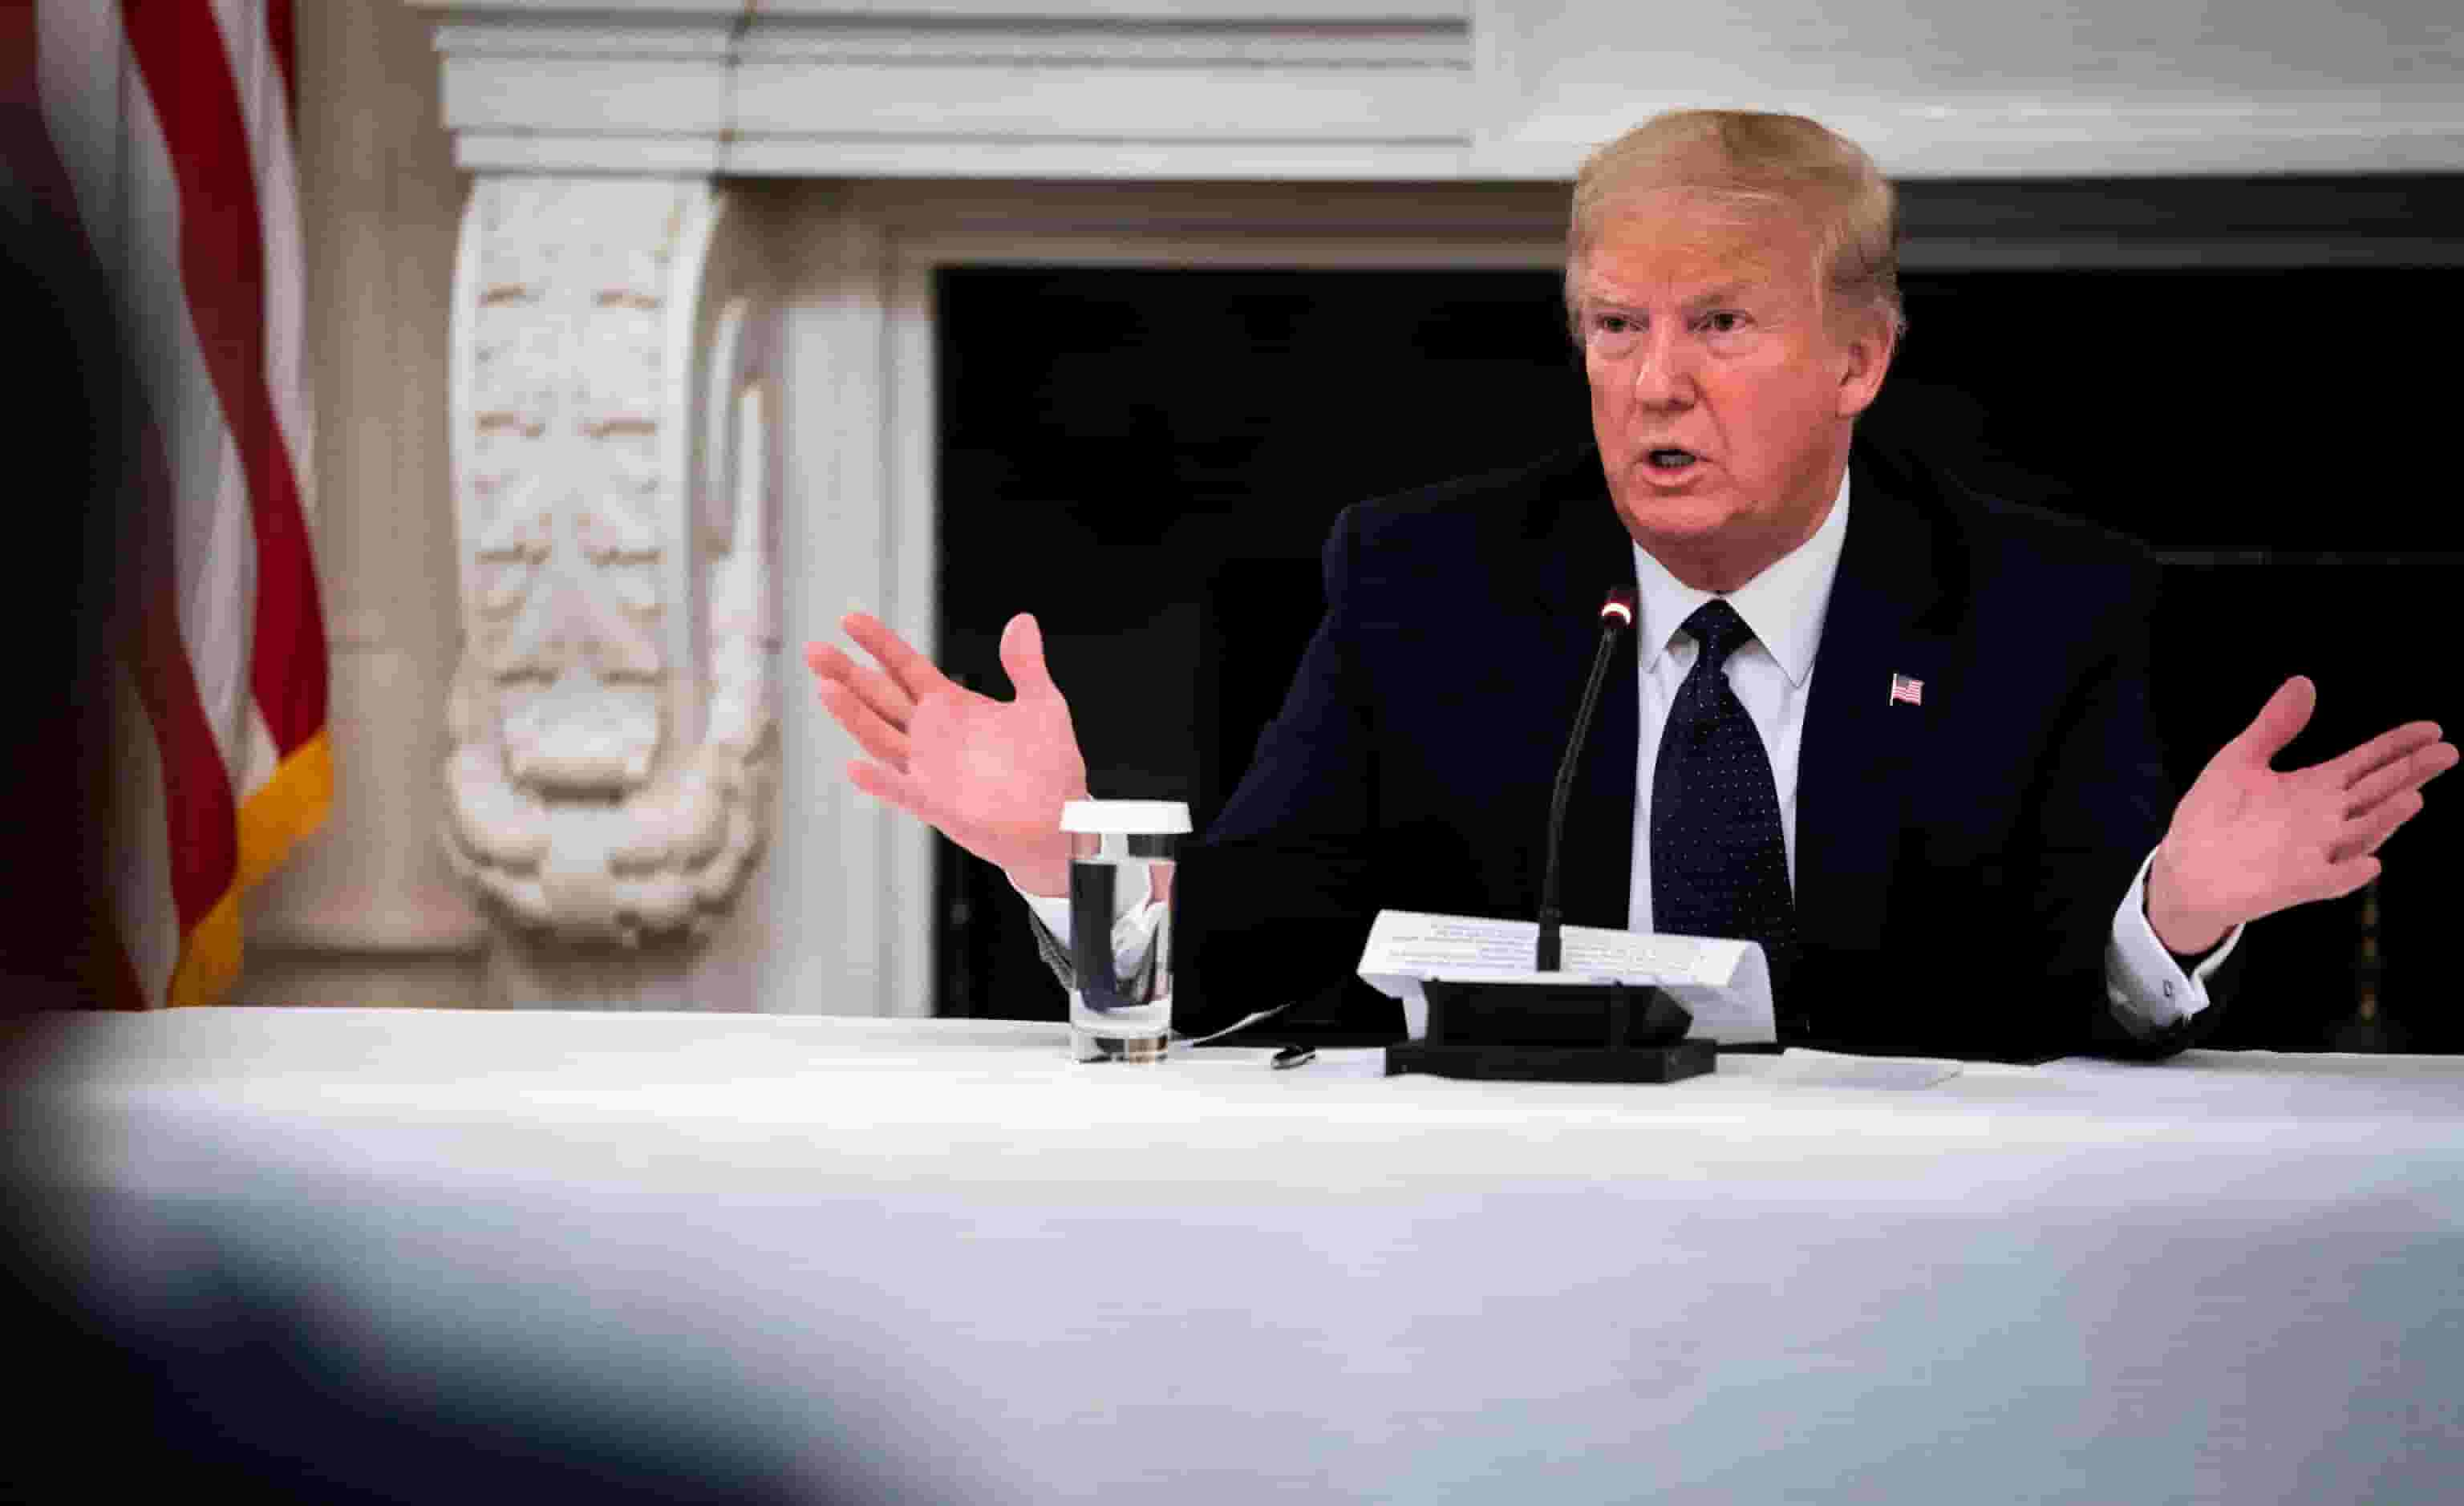 Usque tandem mister Donald Trump abutere pax mundi?